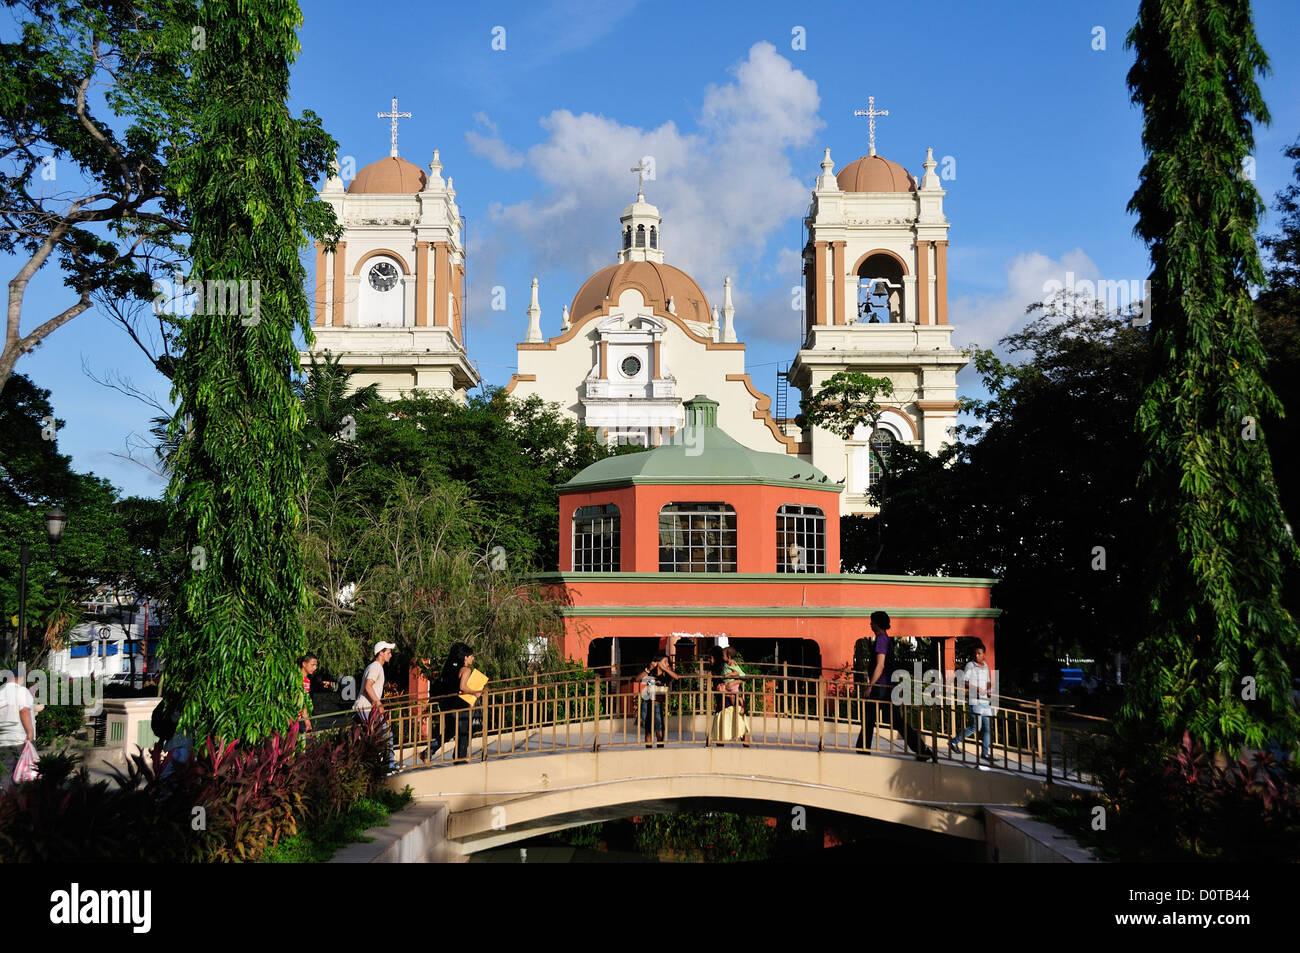 San Pedro Sula, Parque Central, Cathedral, church, Central America, Honduras, Stock Photo